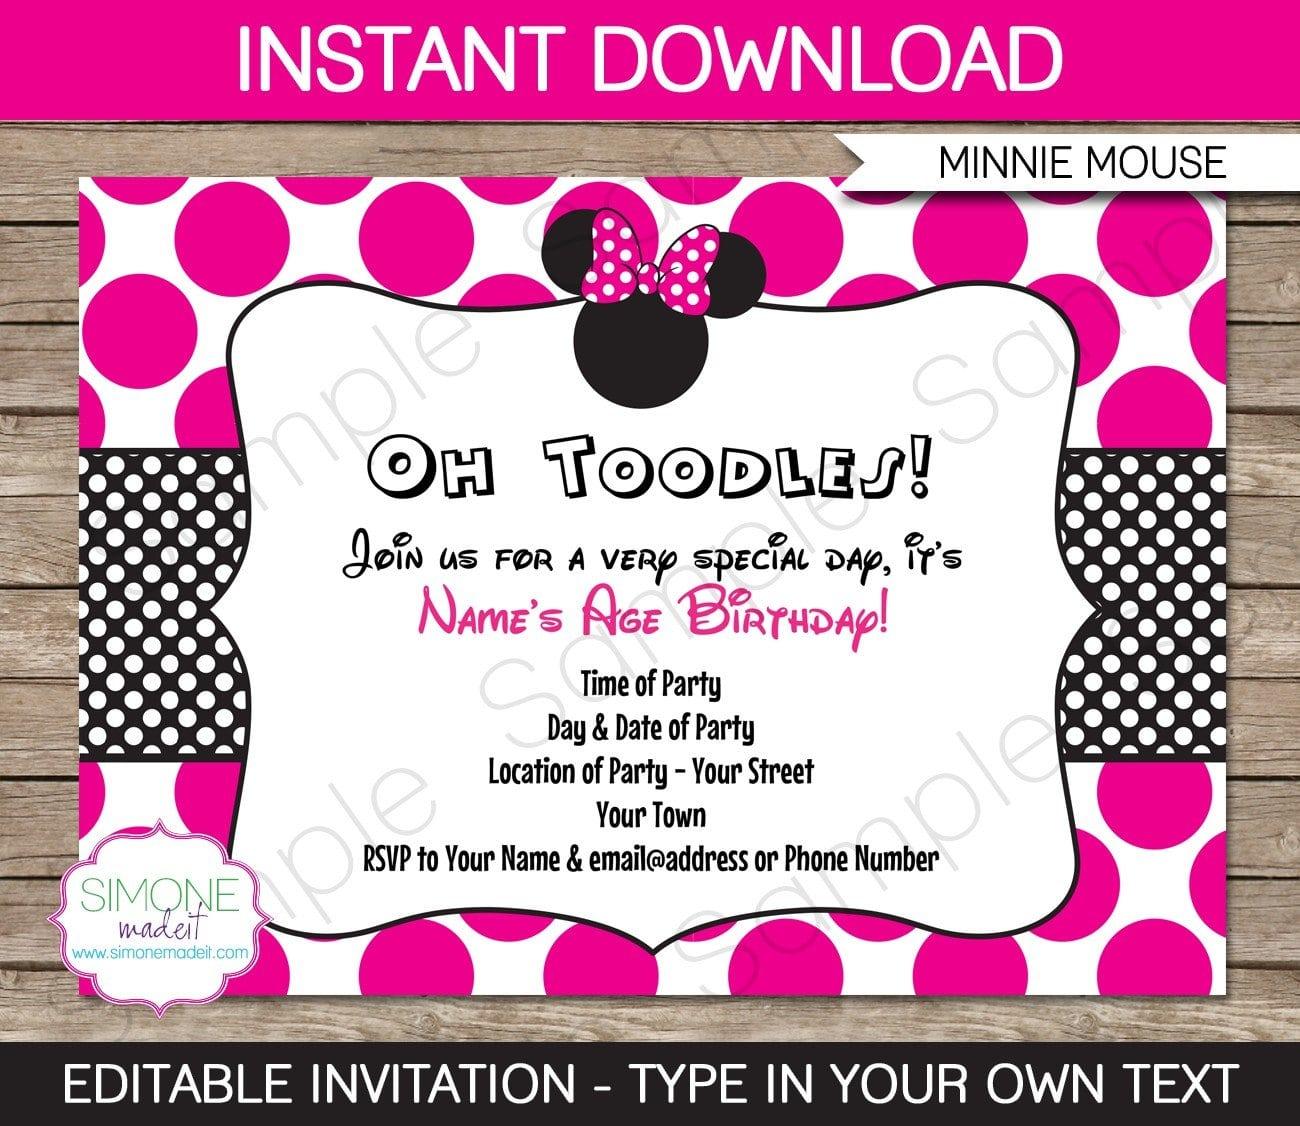 Free Invitation Templates Minnie Mouse 2015